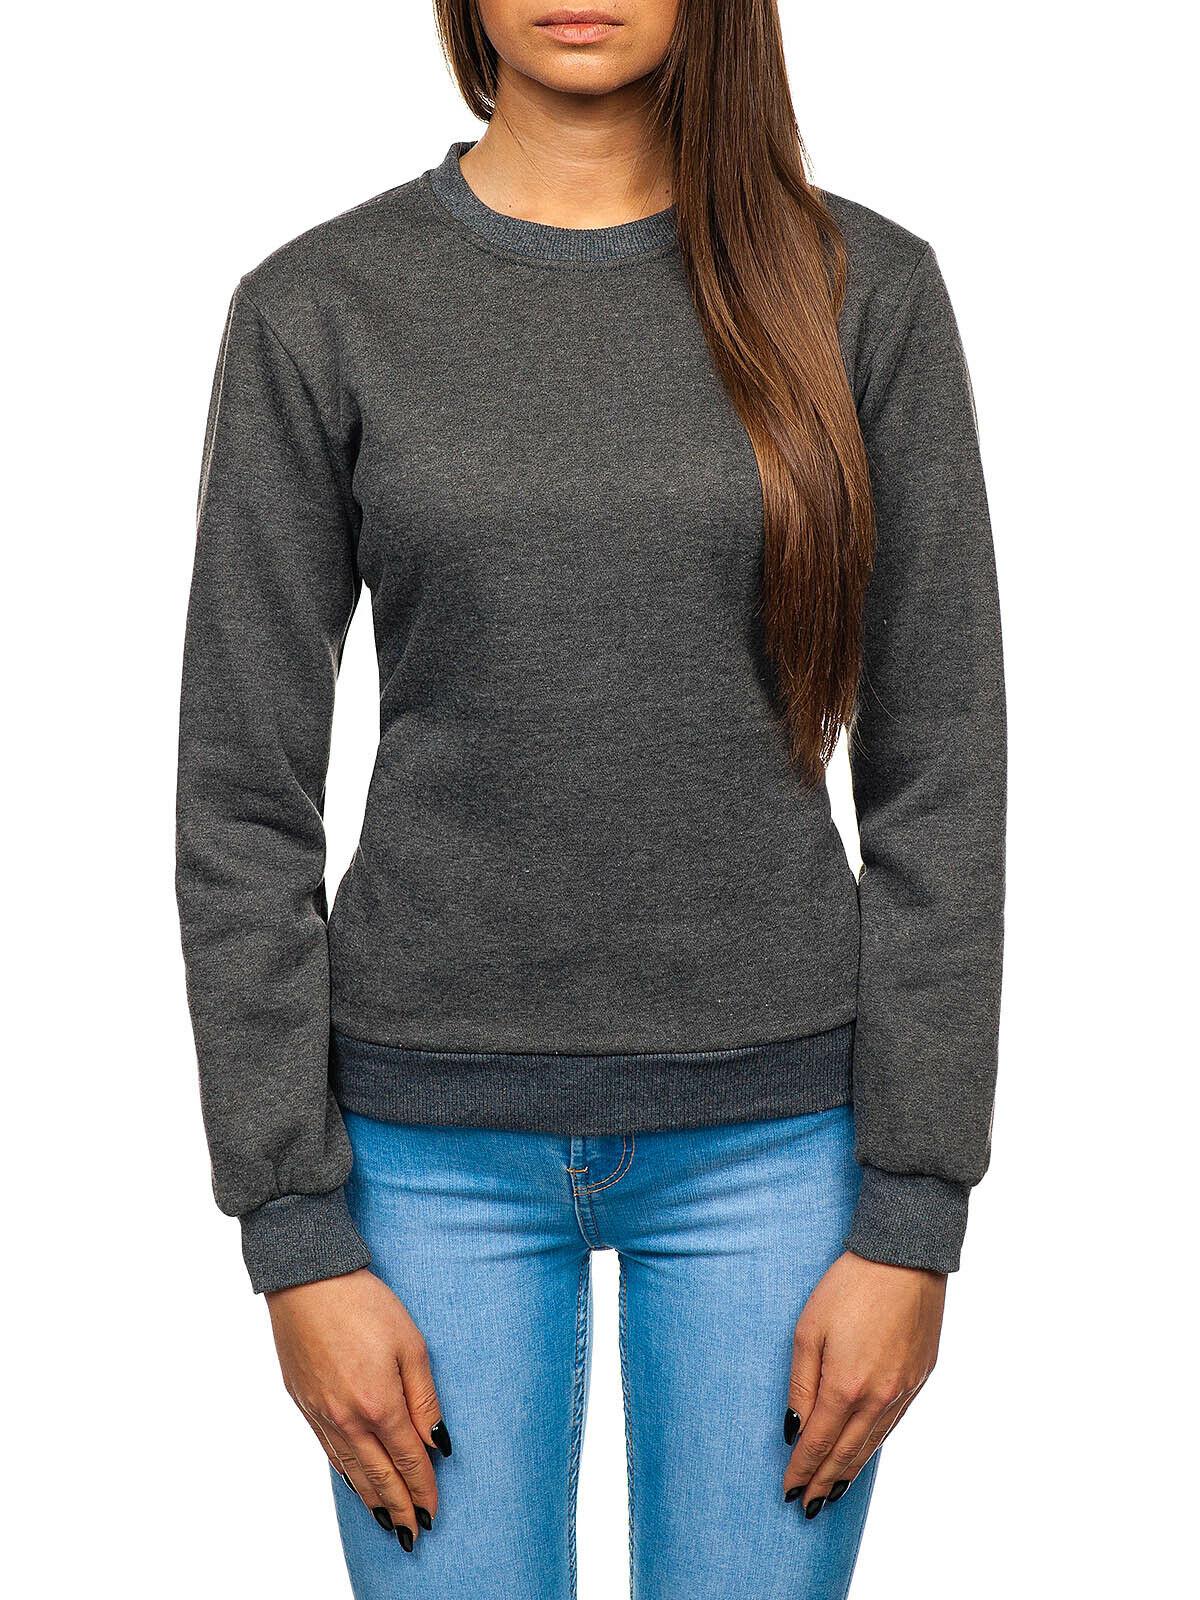 Sweatshirt Langarmshirt Pulli Basic Rundhals Sport Unifarben Damen BOLF Classic